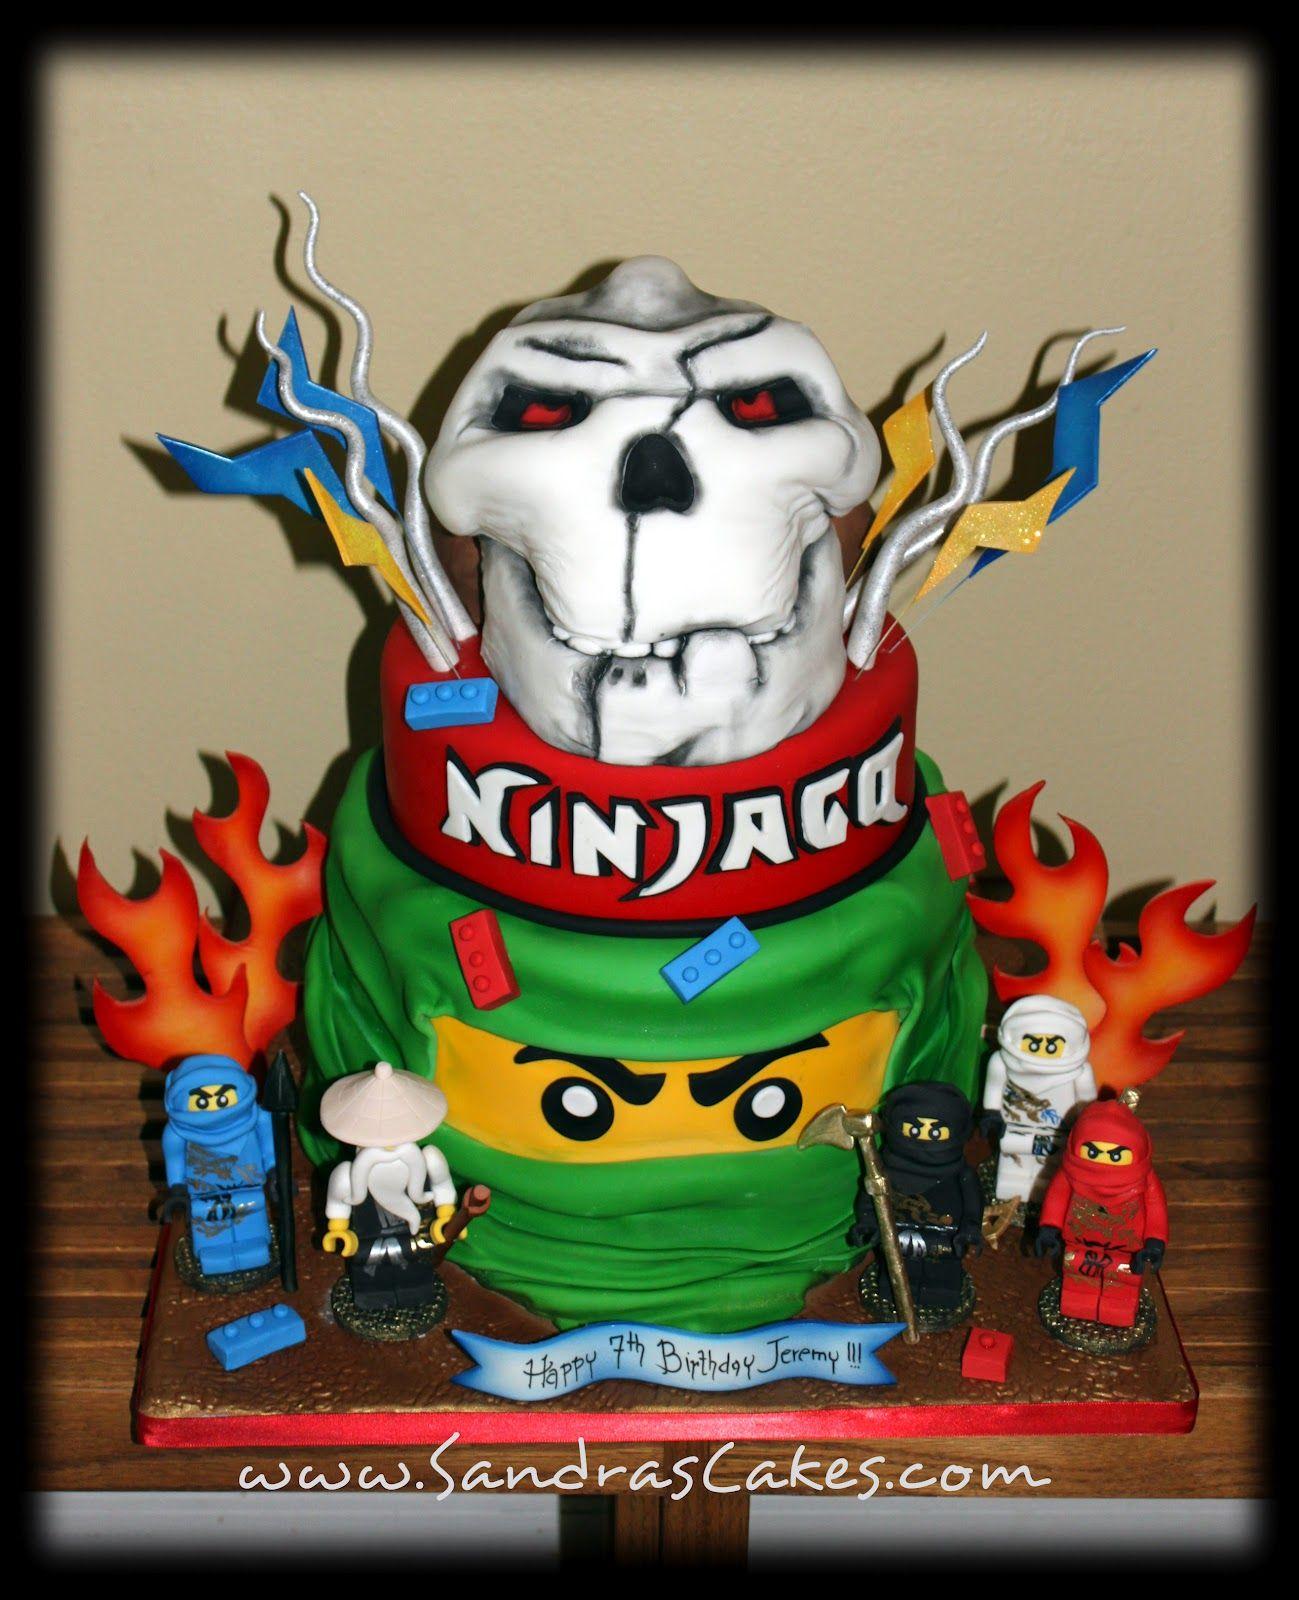 Lego Ninjago Birthday Party Google Search: Ninjago Theme On Pinterest